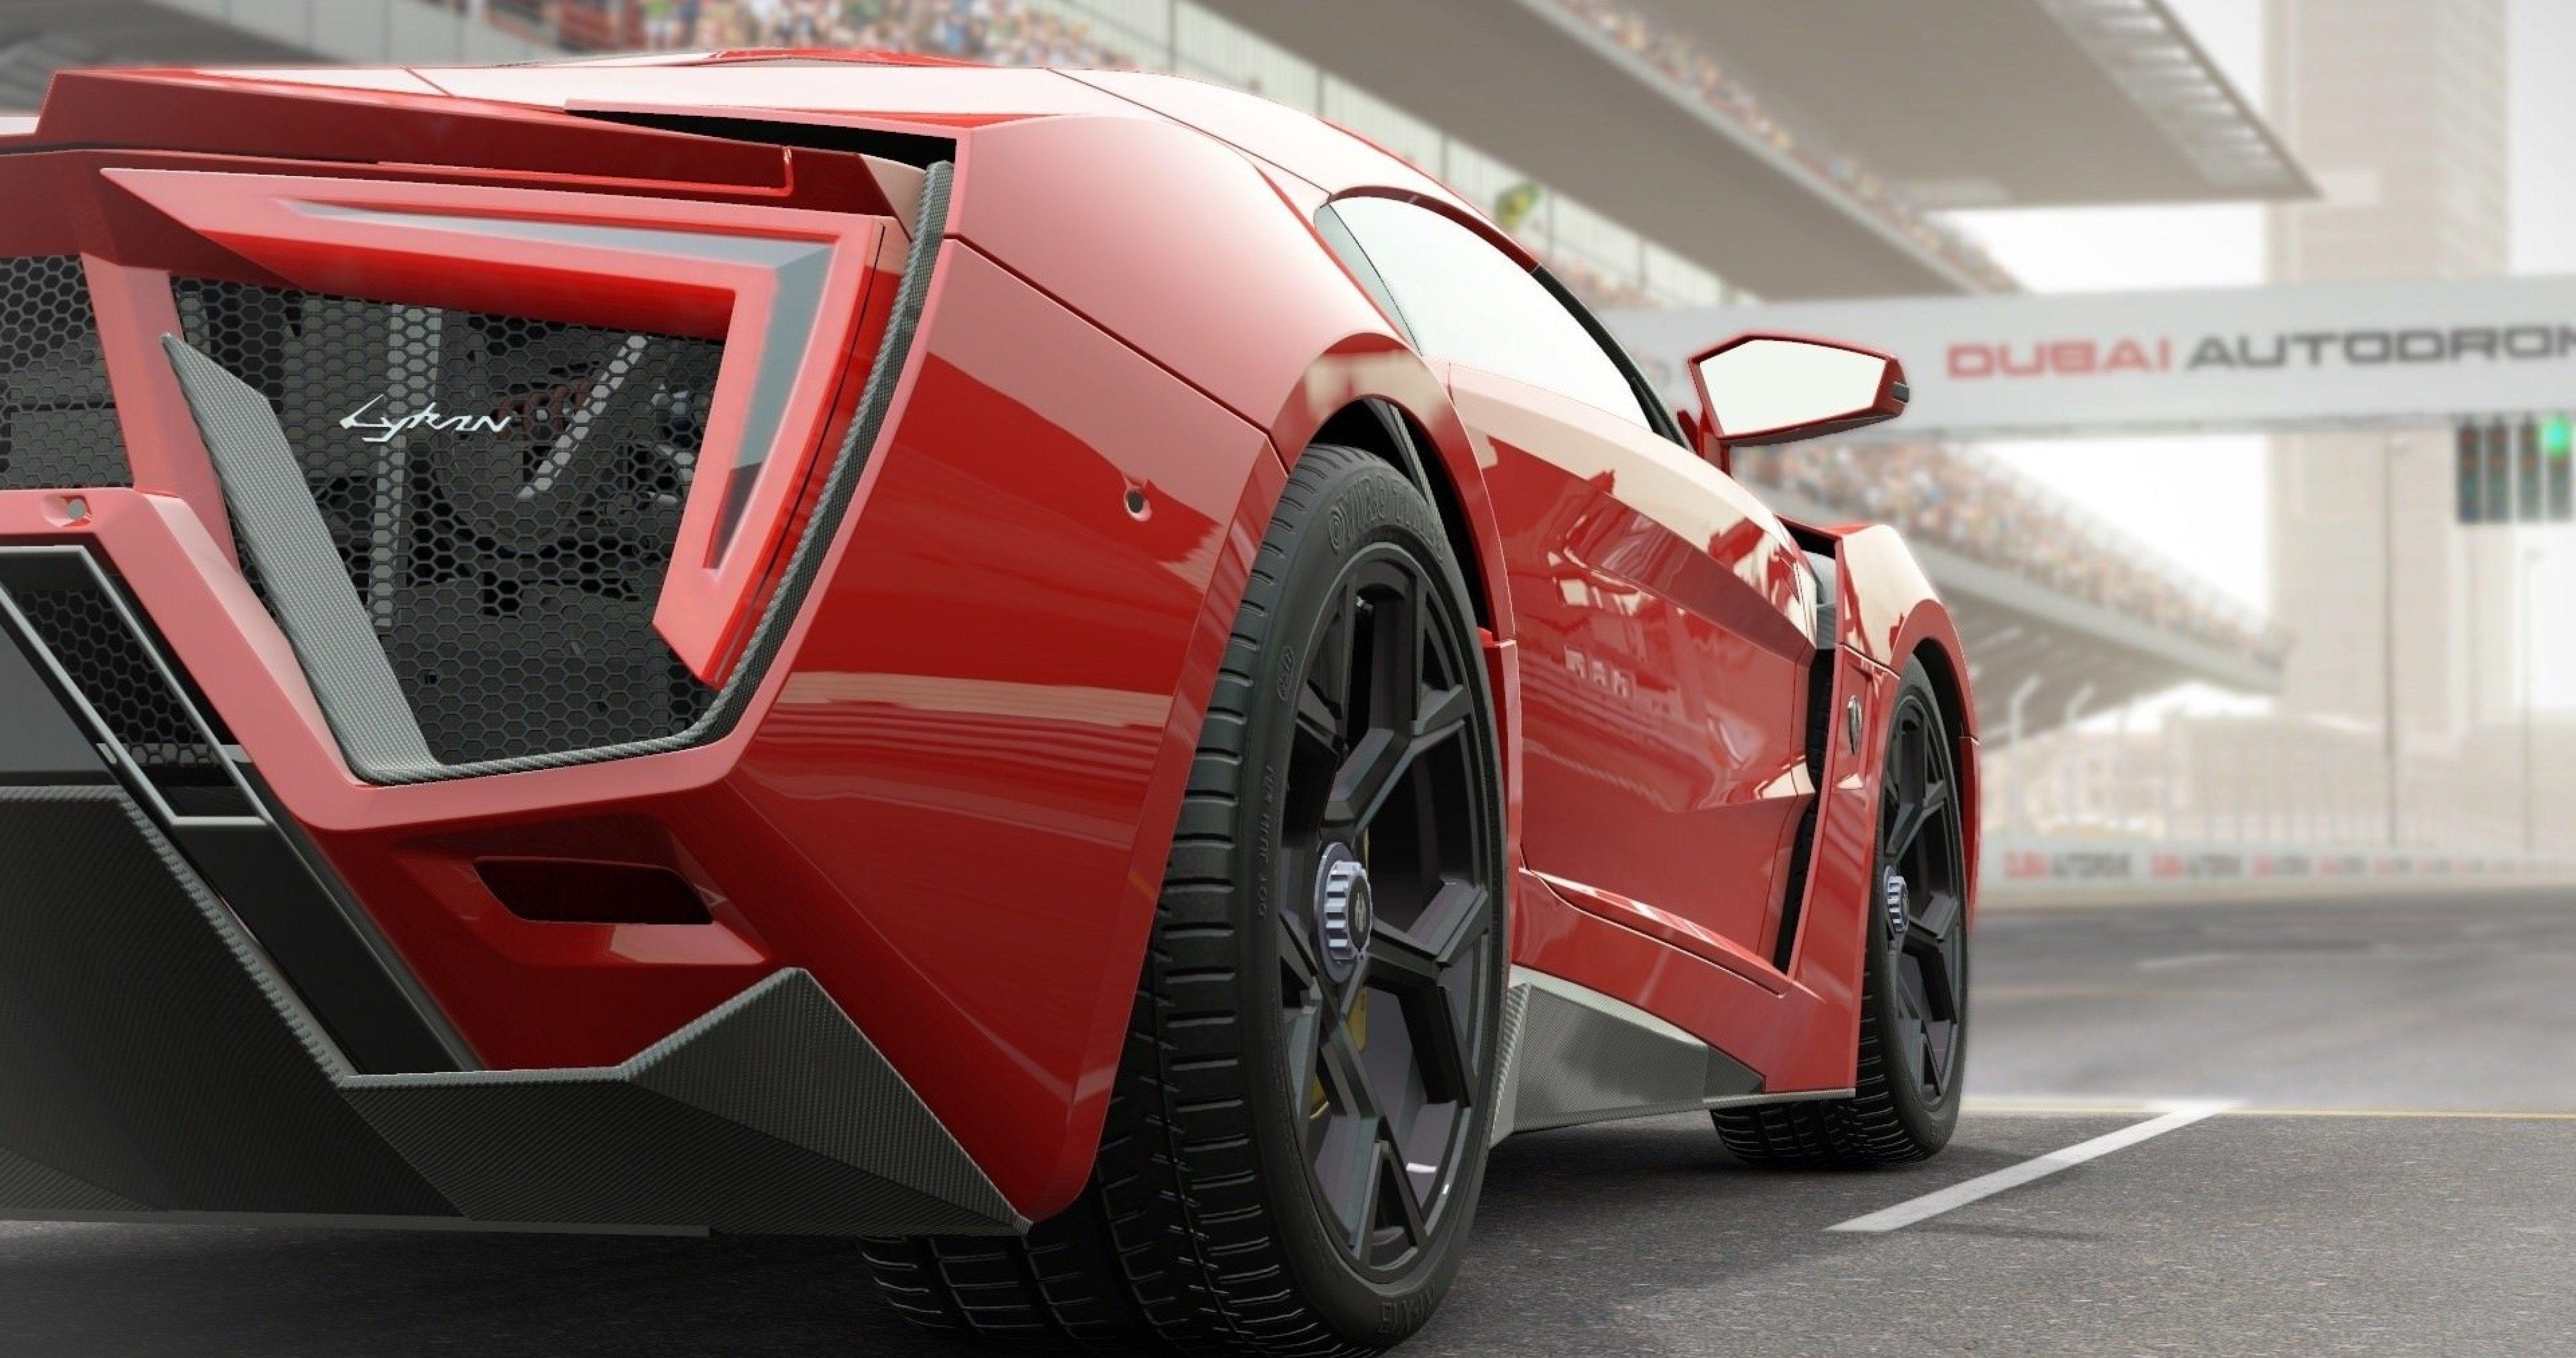 project cars game 4k ultra hd Wallpaper Download Lykan 4096x2160